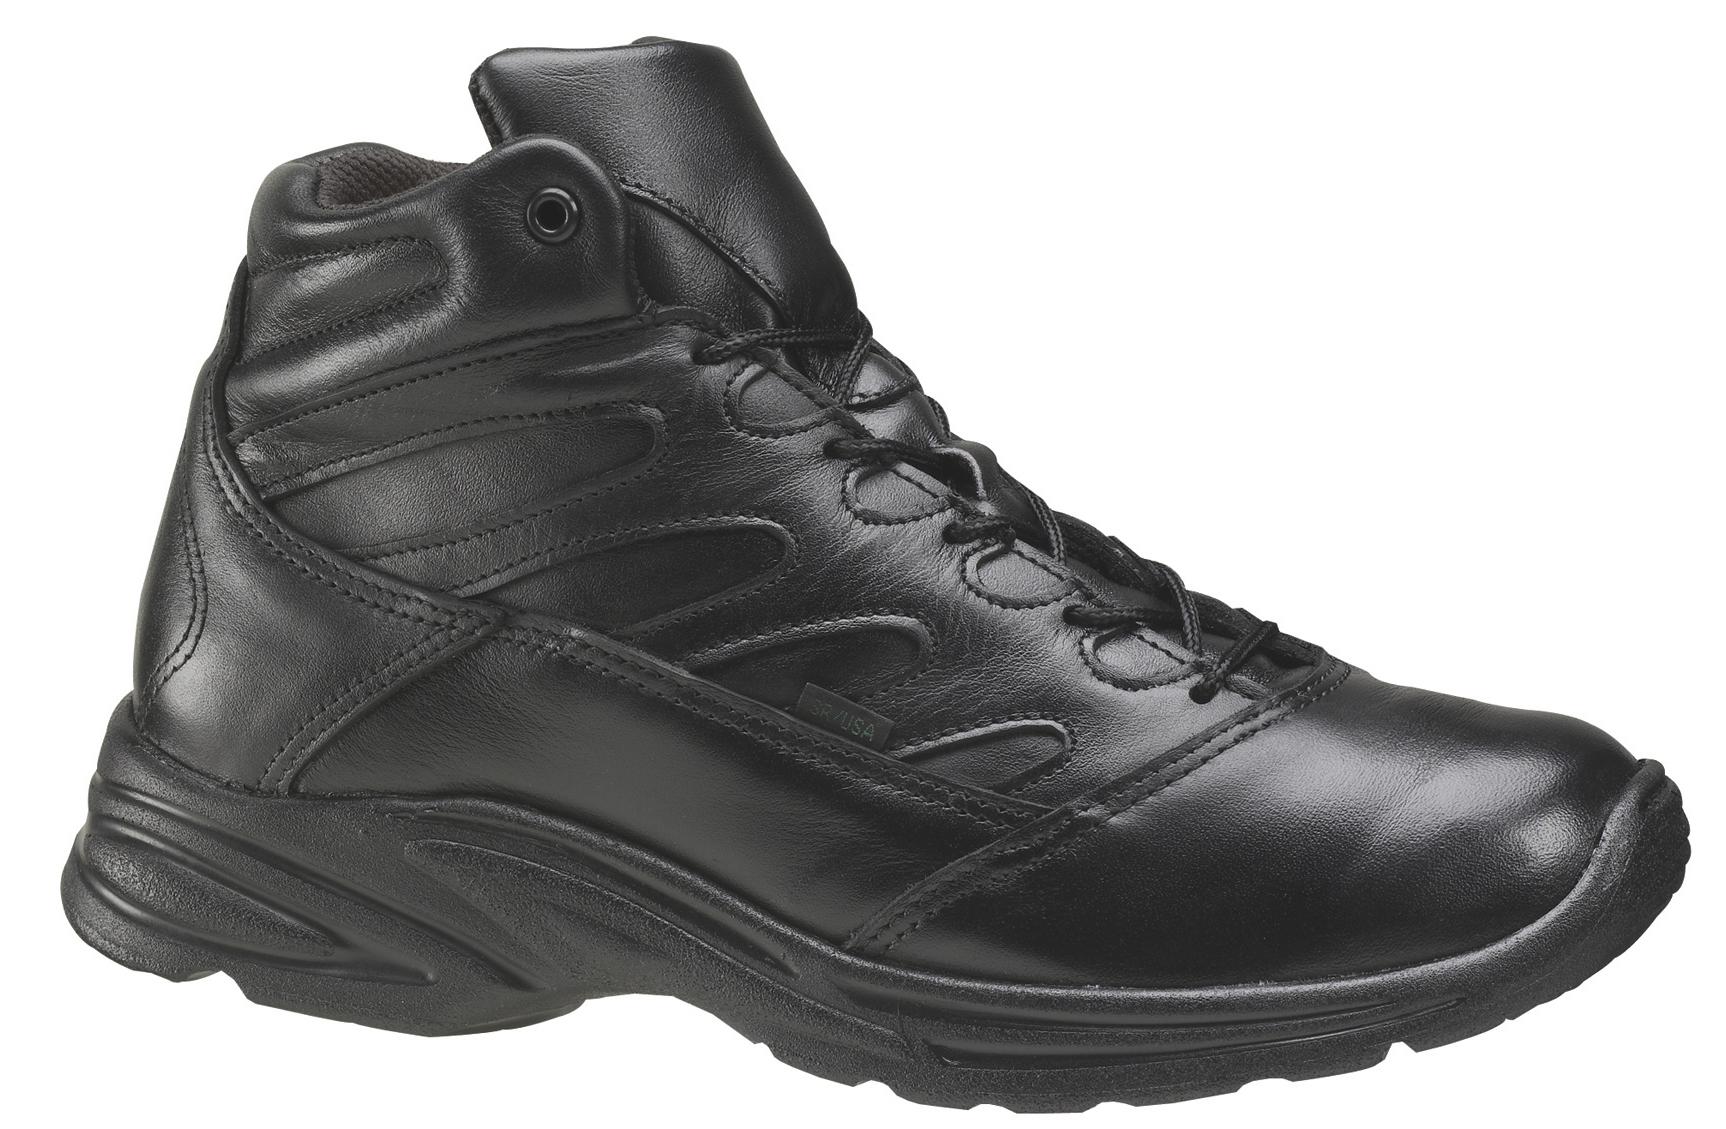 Thorogood Mens Thorogood Uniform Work Shoe Athletics Mid Cut Liberty (EE+) Black 834-6933